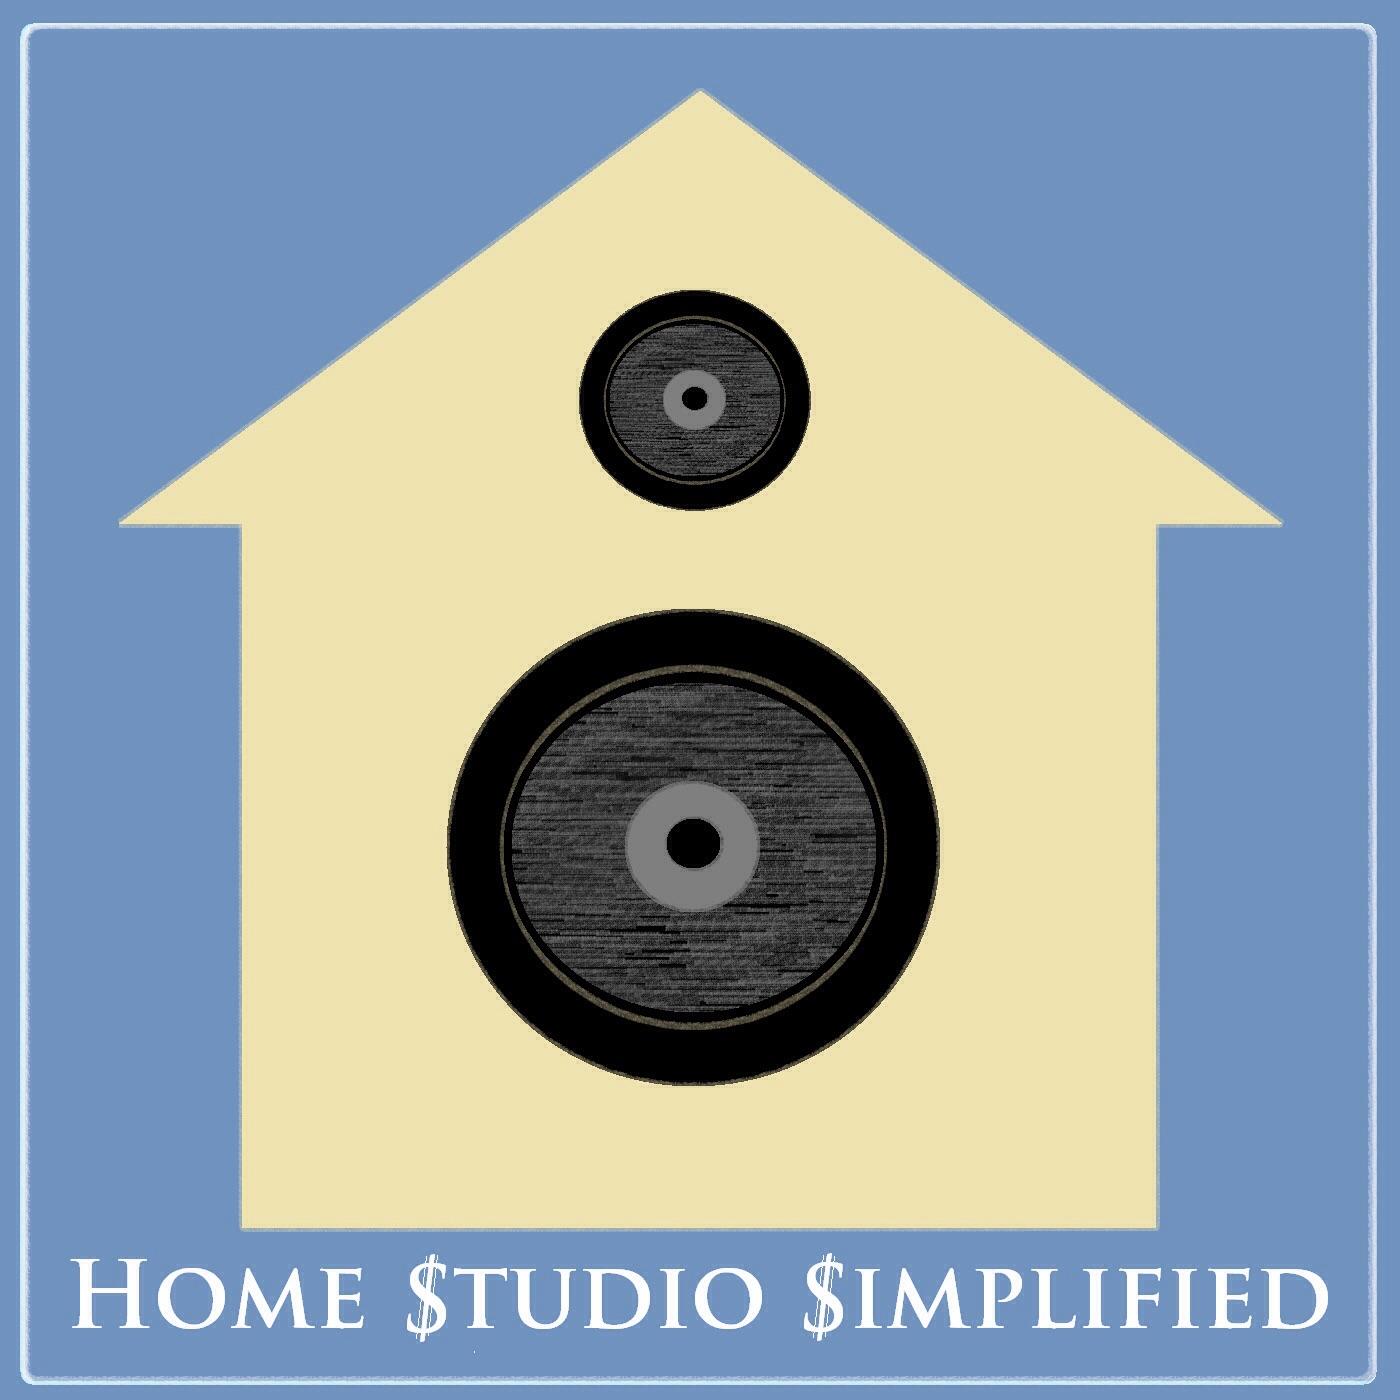 Home Studio Simplified logo